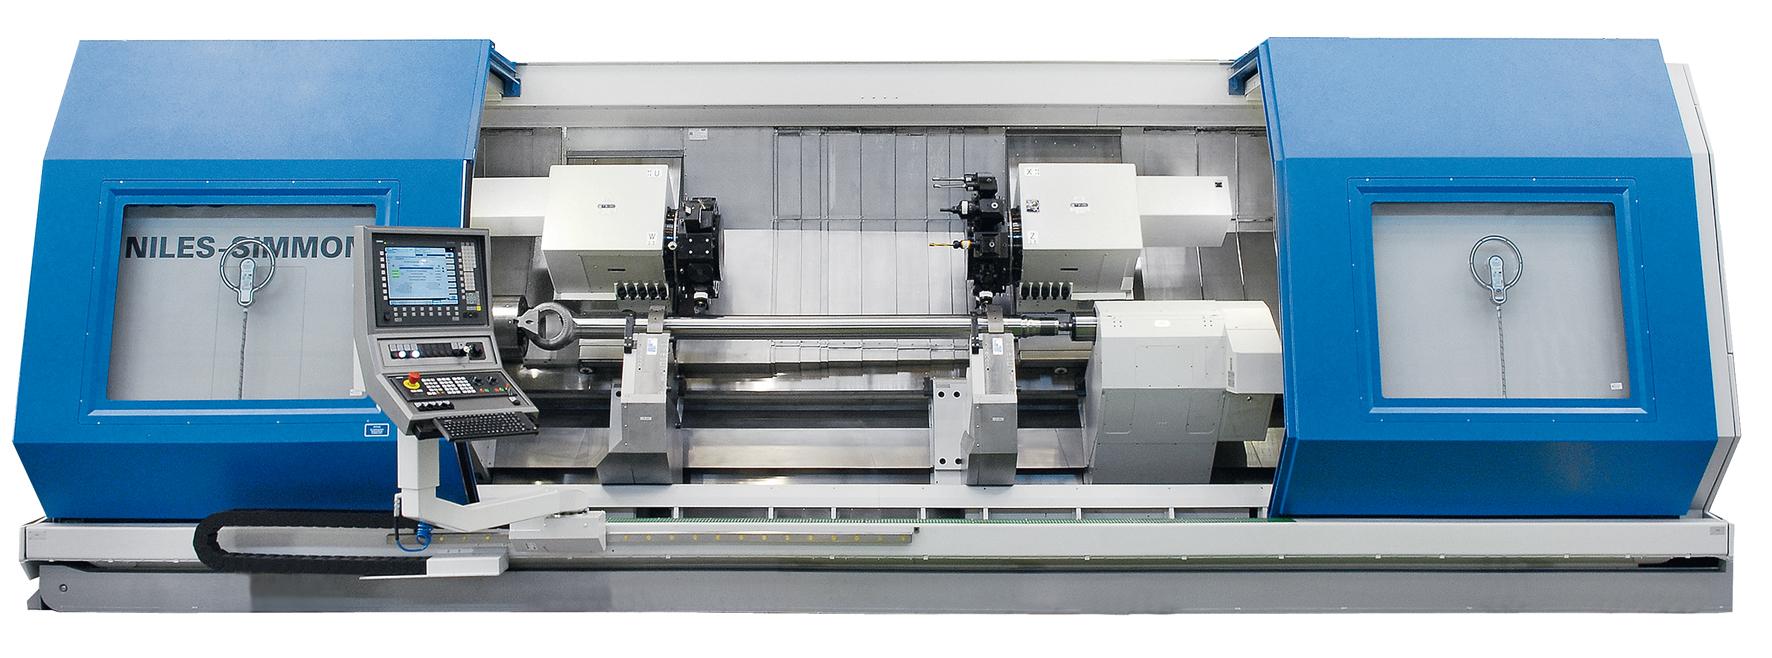 Niles-Simmons N30 CNC Lathe